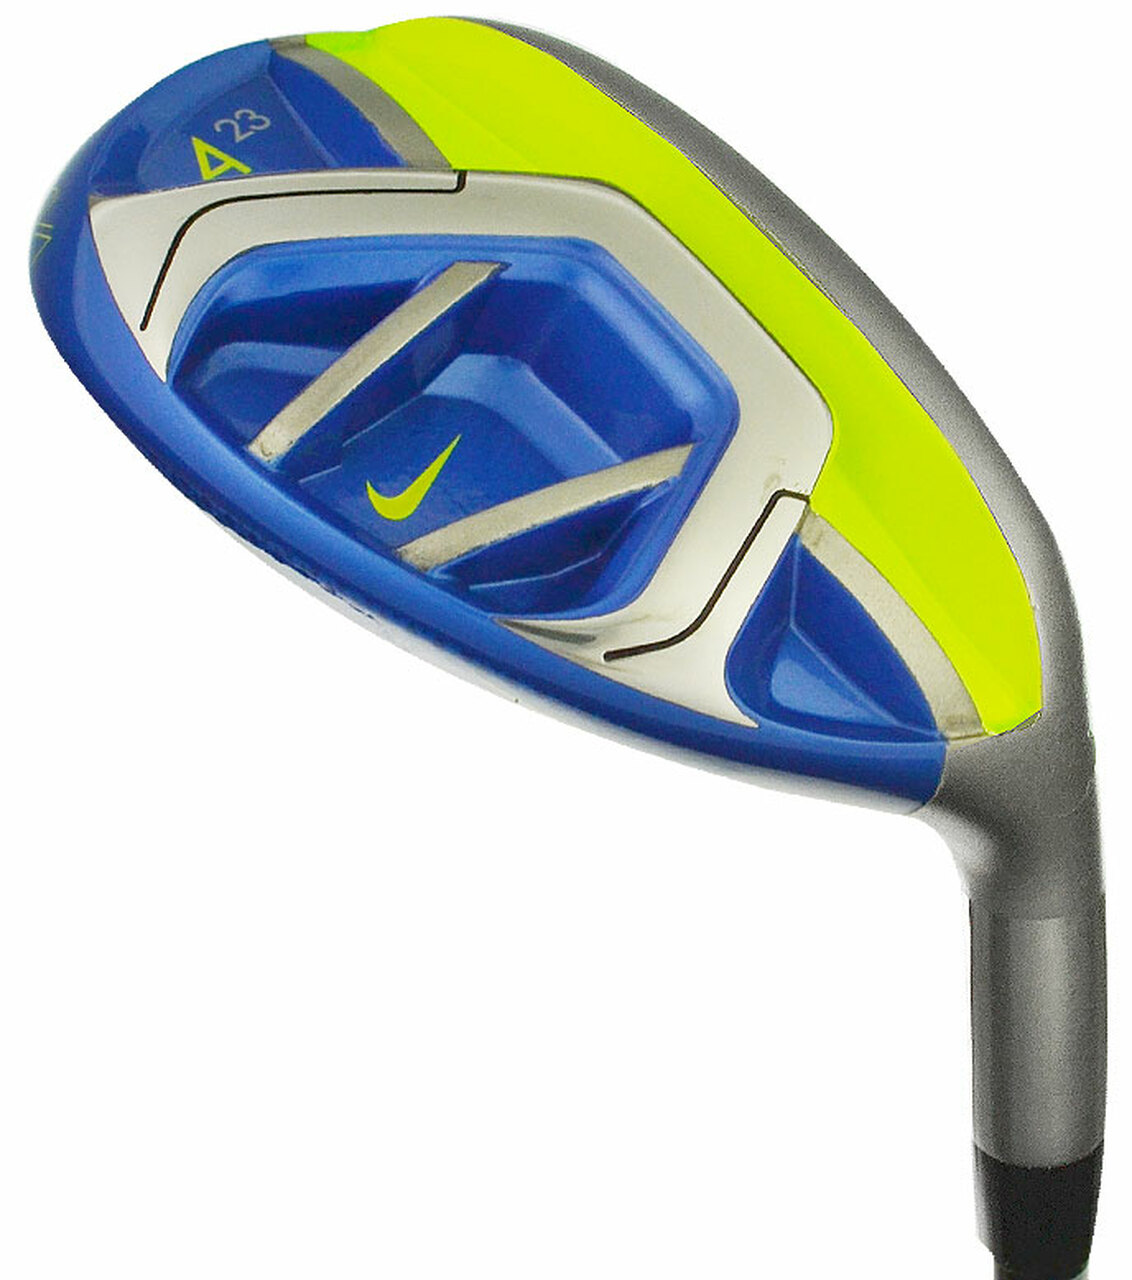 metal curso Expectativa  Pre-Owned Nike Golf Vapor Fly Hybrid | RockBottomGolf.com